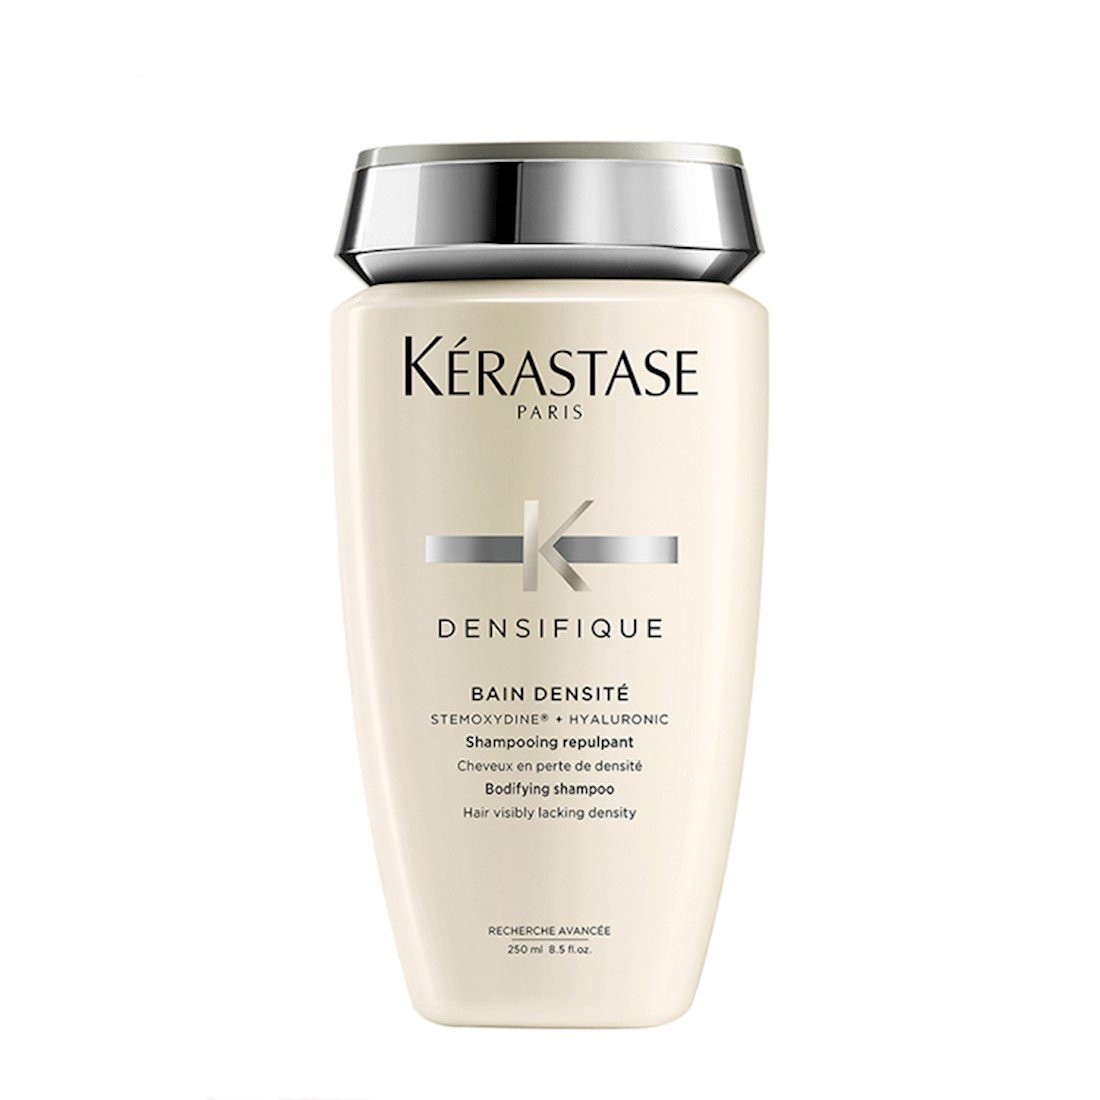 Kérastase Densifique Bain Densité Shampoo 250ml - CA